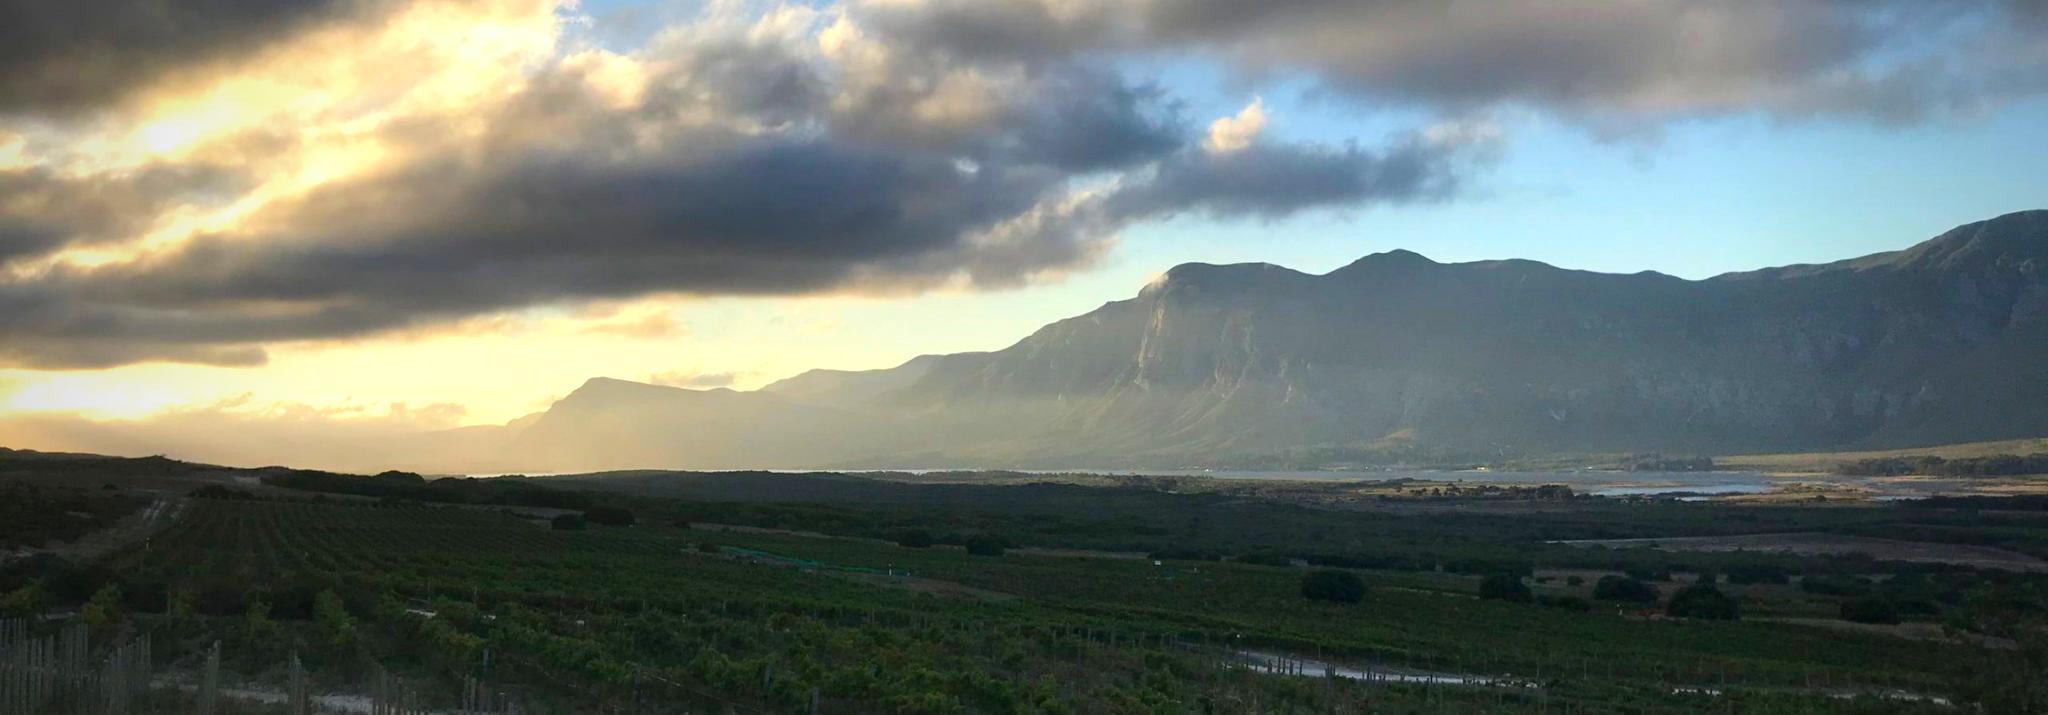 Springfontein-IG-Hermanus-Western-Cape